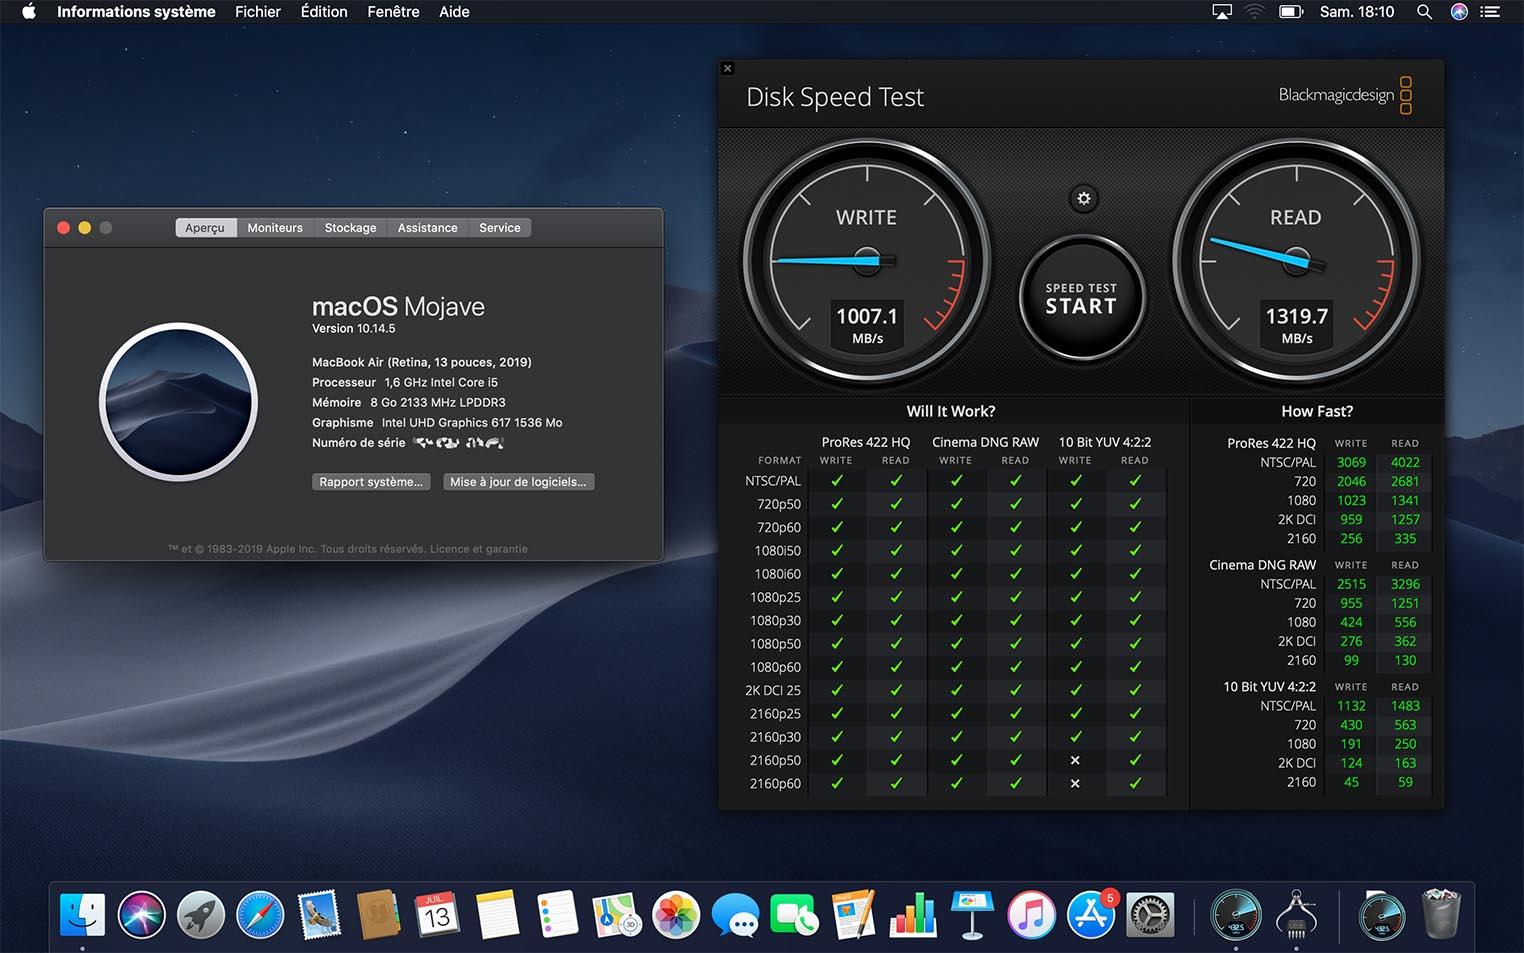 2019 256GB MacBook Air has a slower SSD than 2018 model